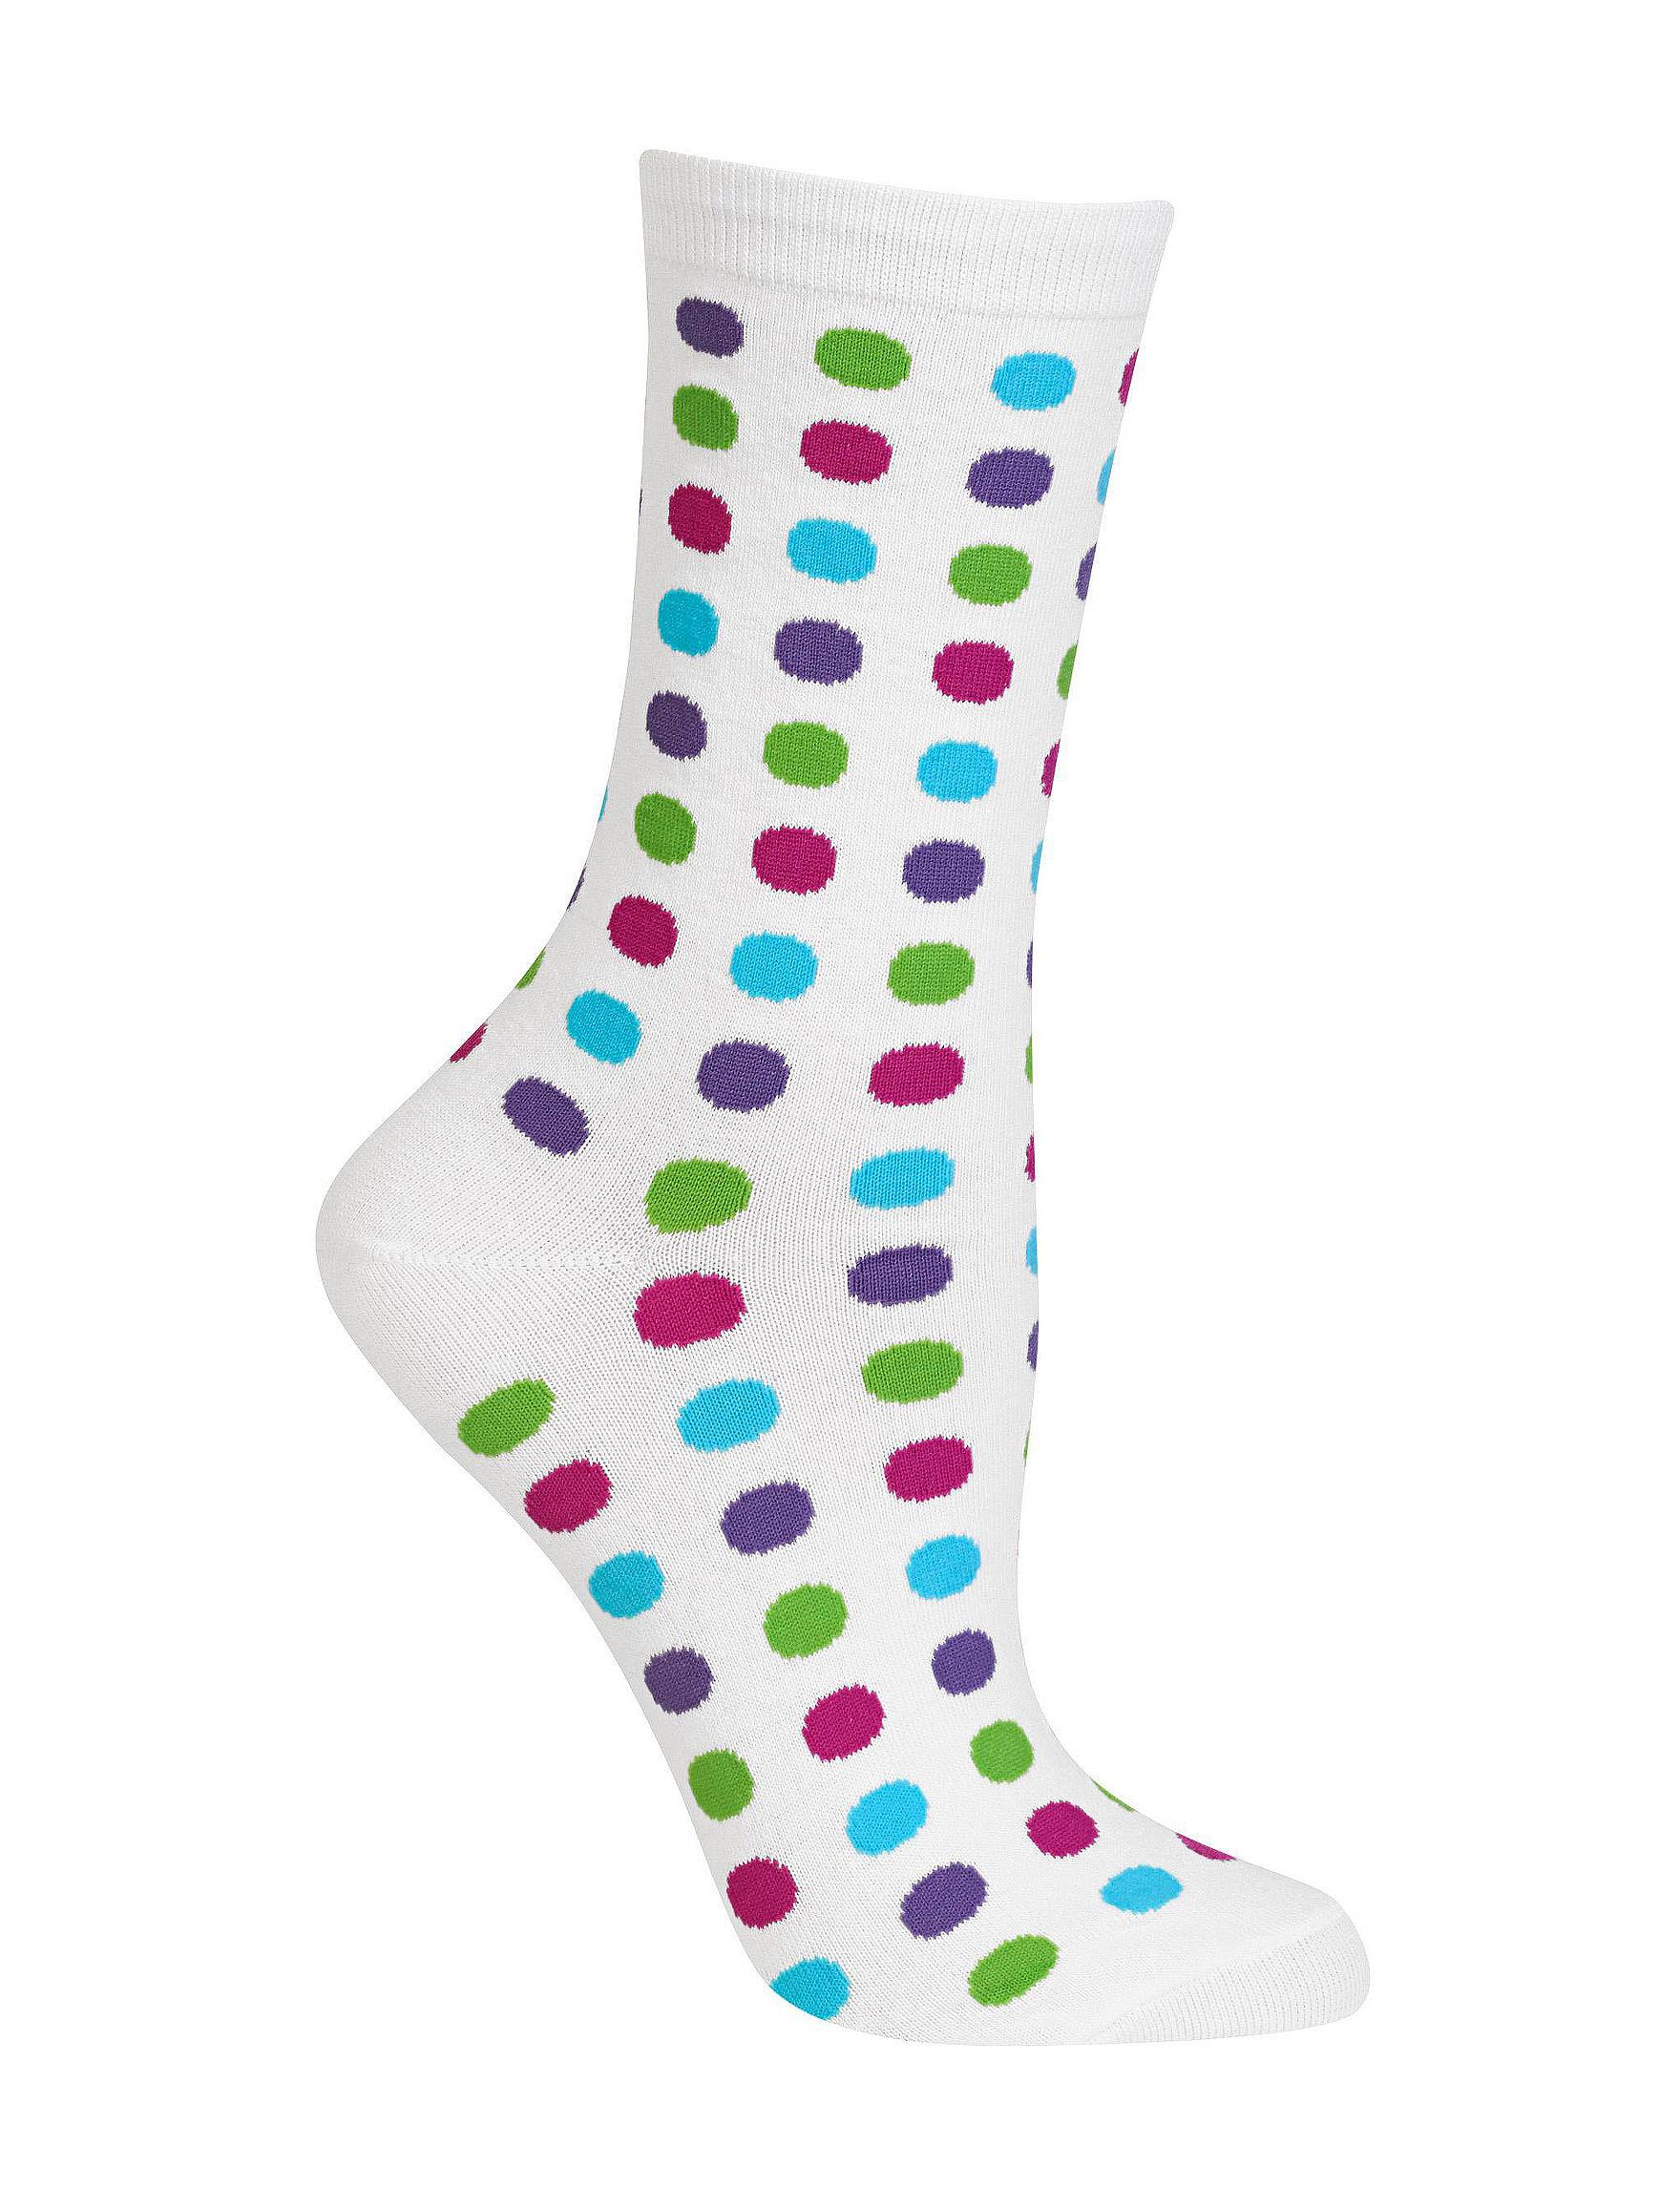 Hot Sox White Socks